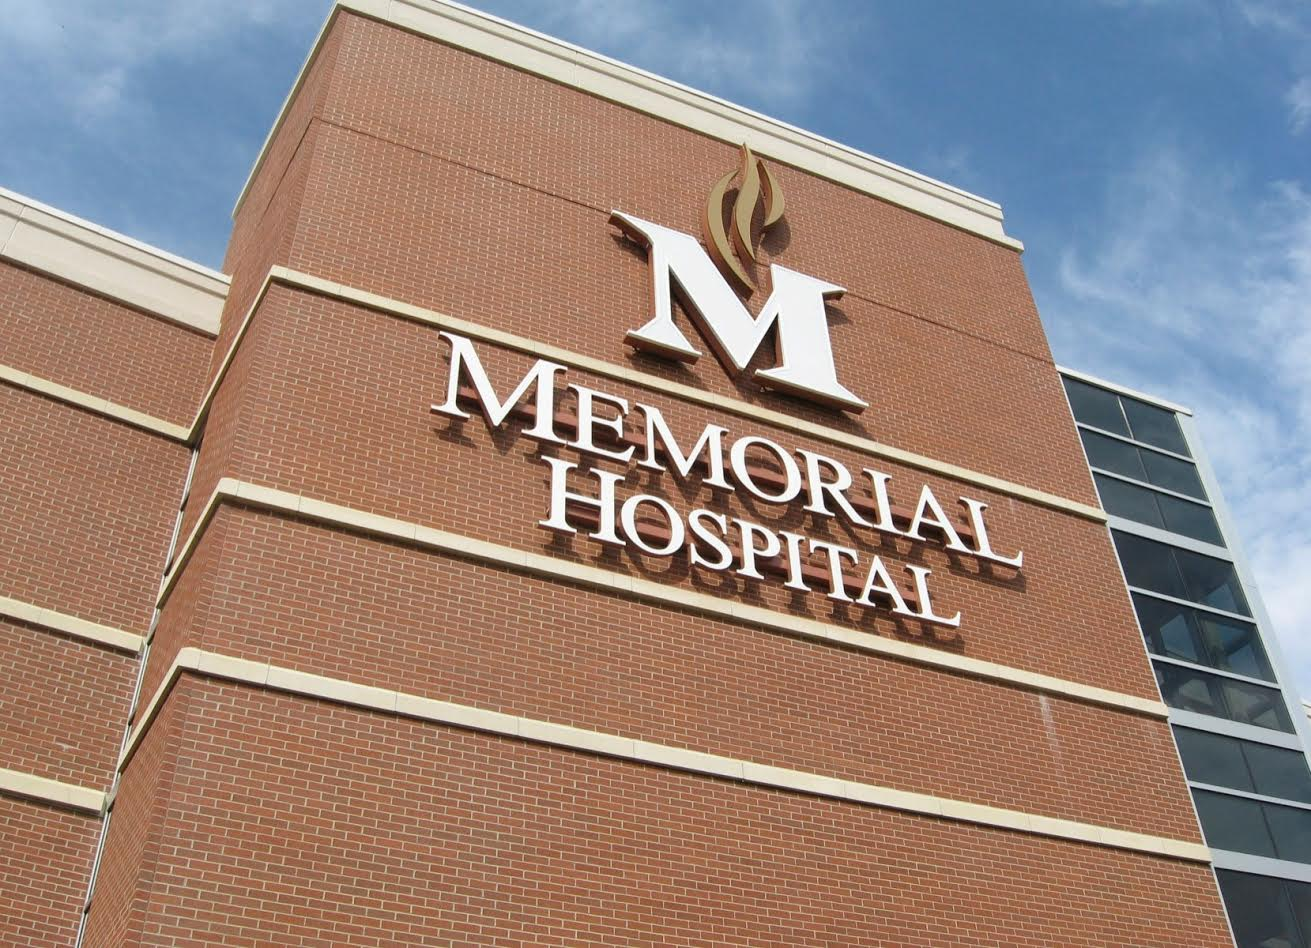 Memorial Hospital – East Campus